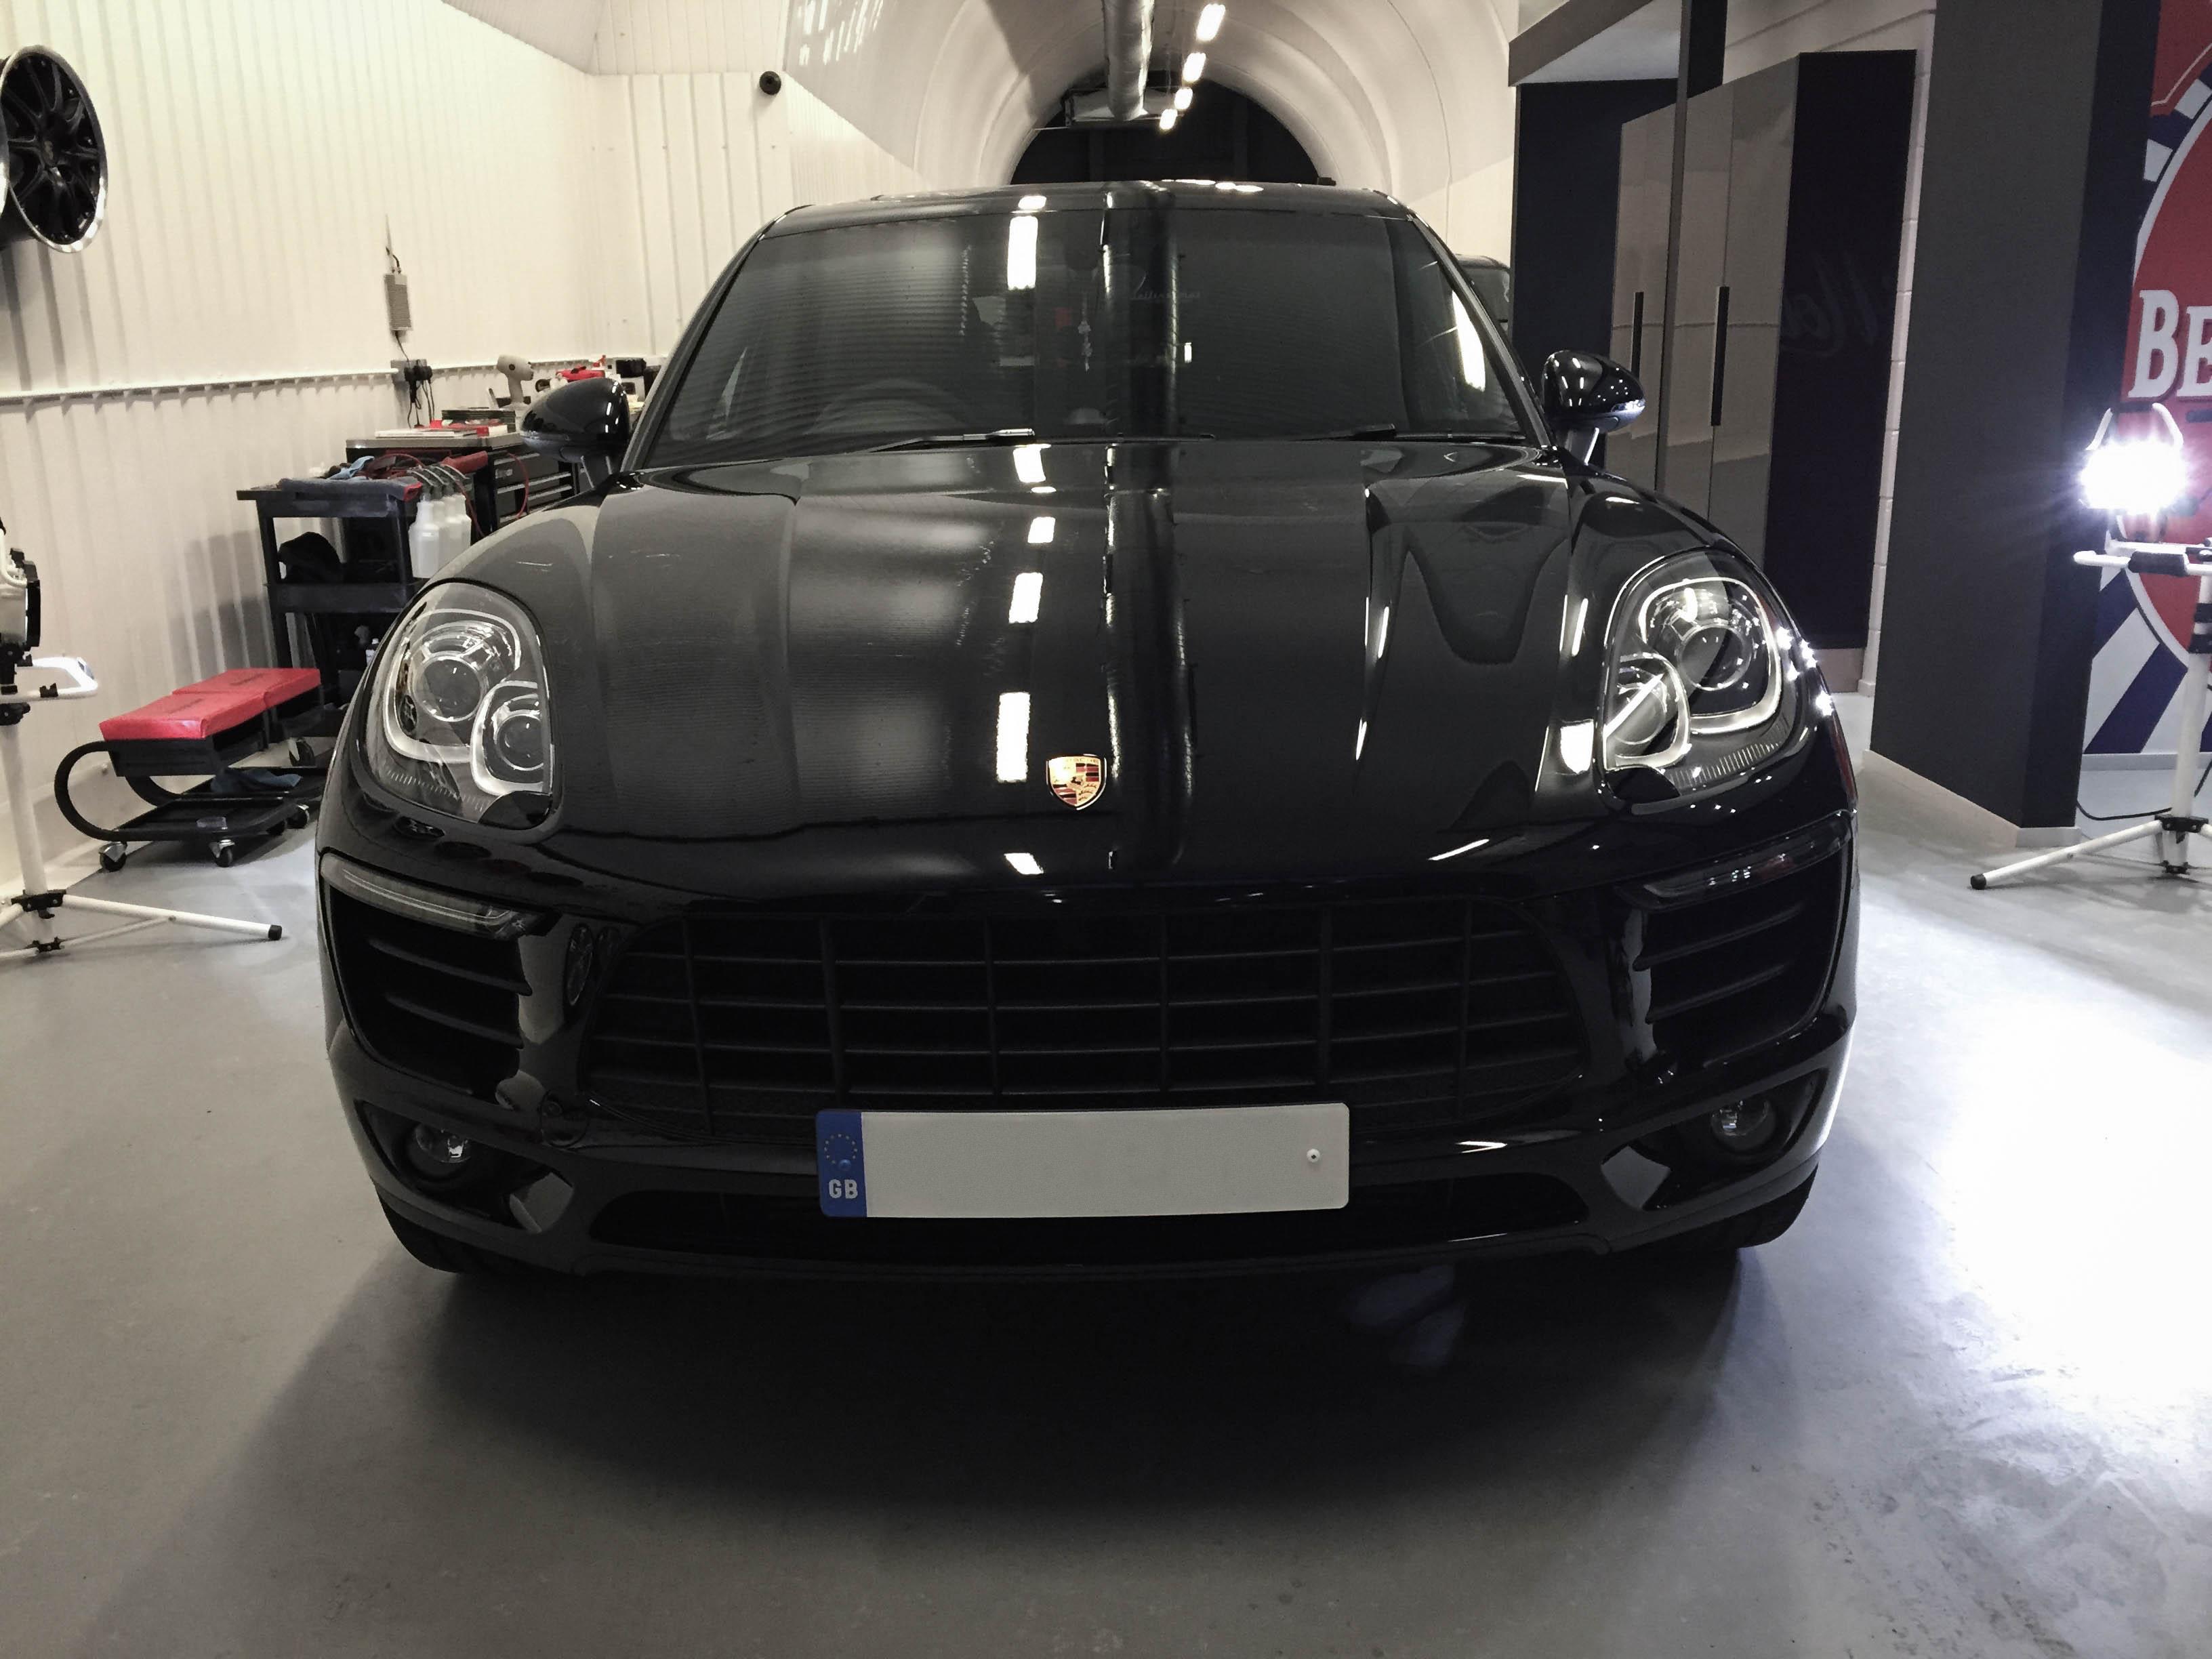 Porsche Macan – Head on